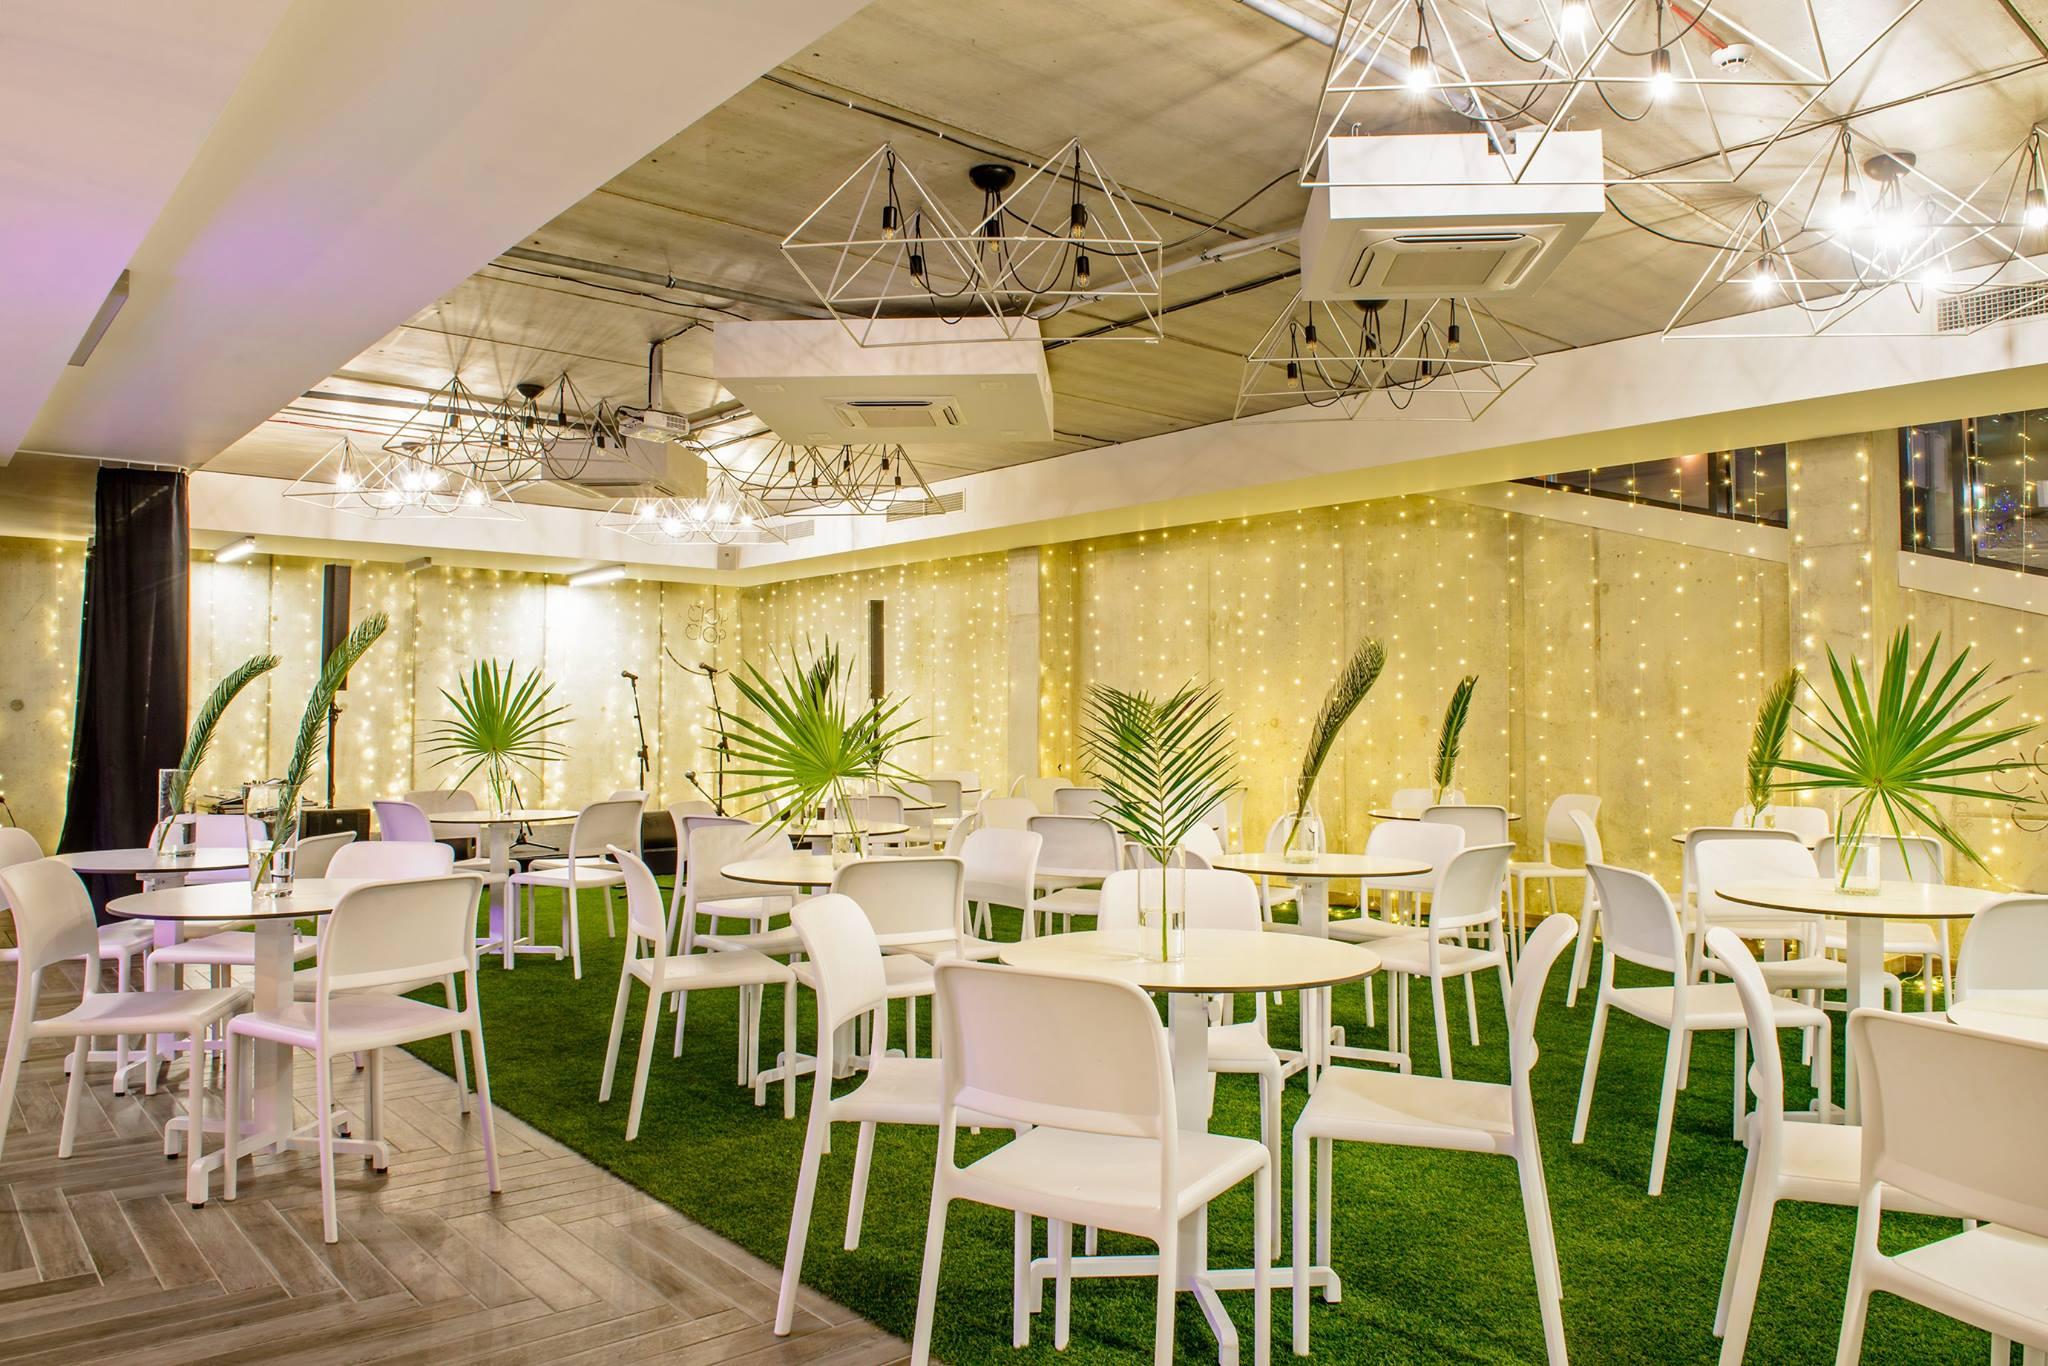 ČIOP ČIOP event studio – kitchen impressions for life